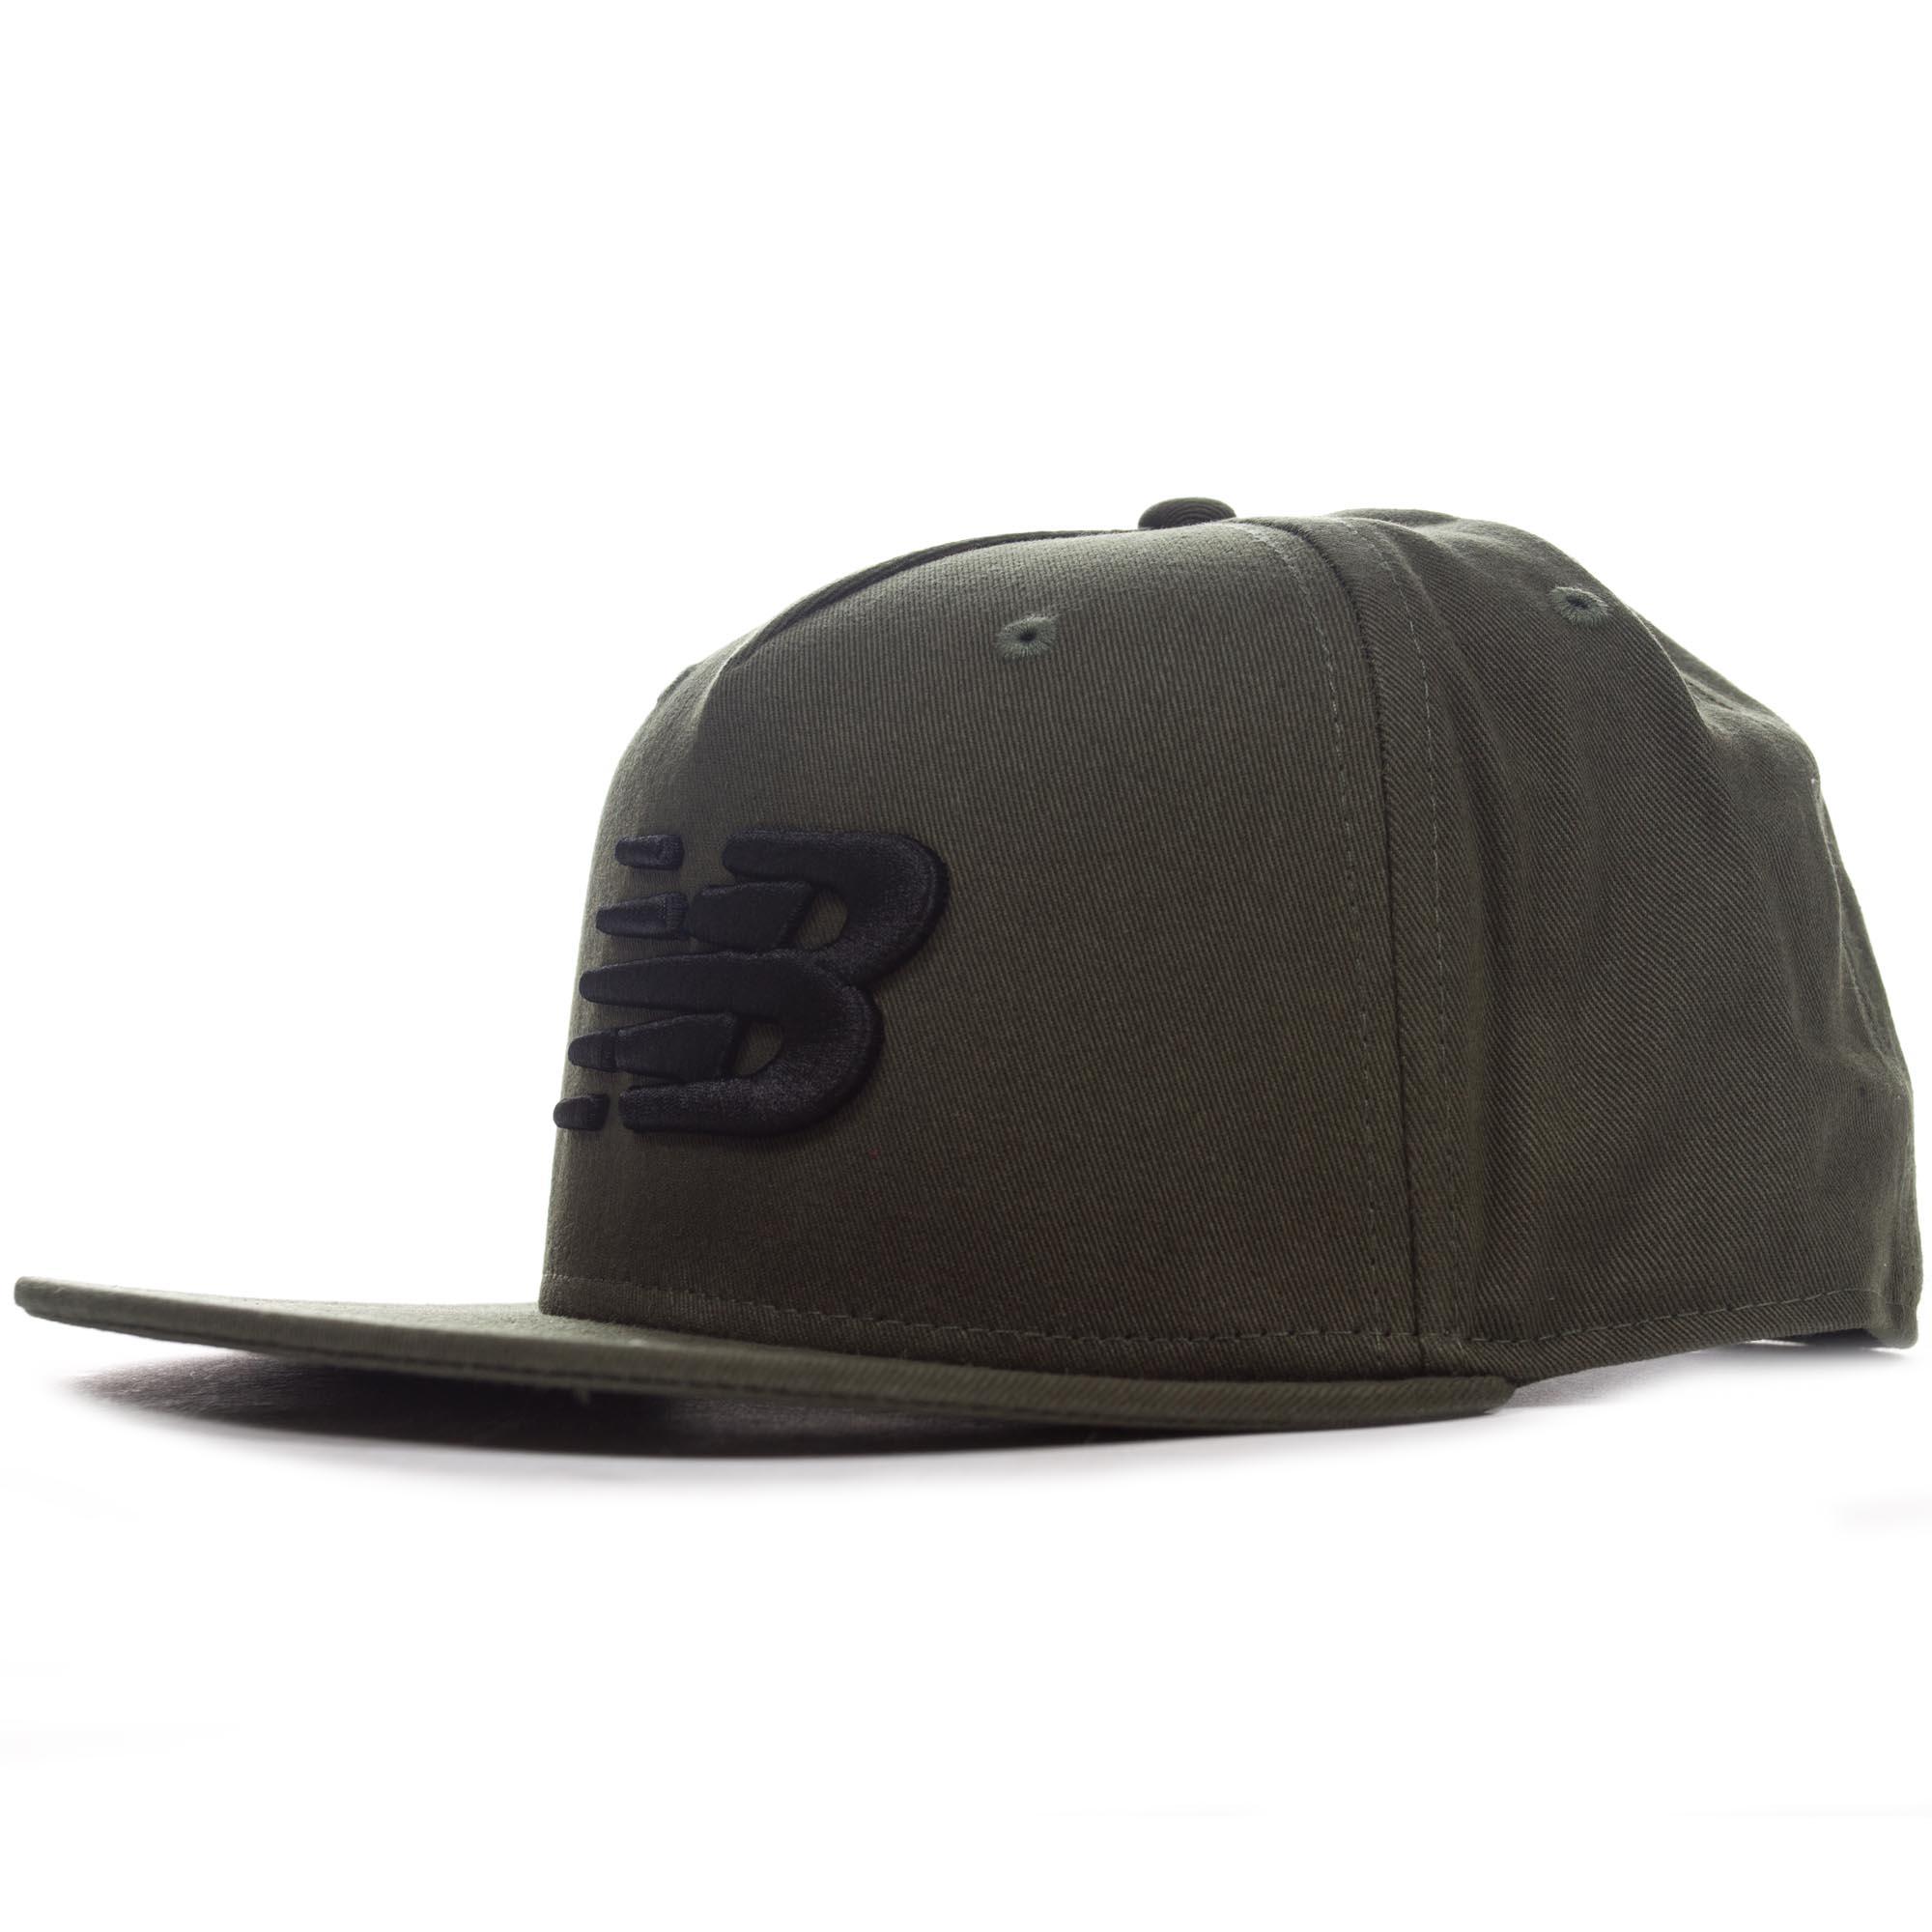 98489ce5f96 New Balance Mens 5-Panel Pro II Logo Snapback Baseball Cap Hat